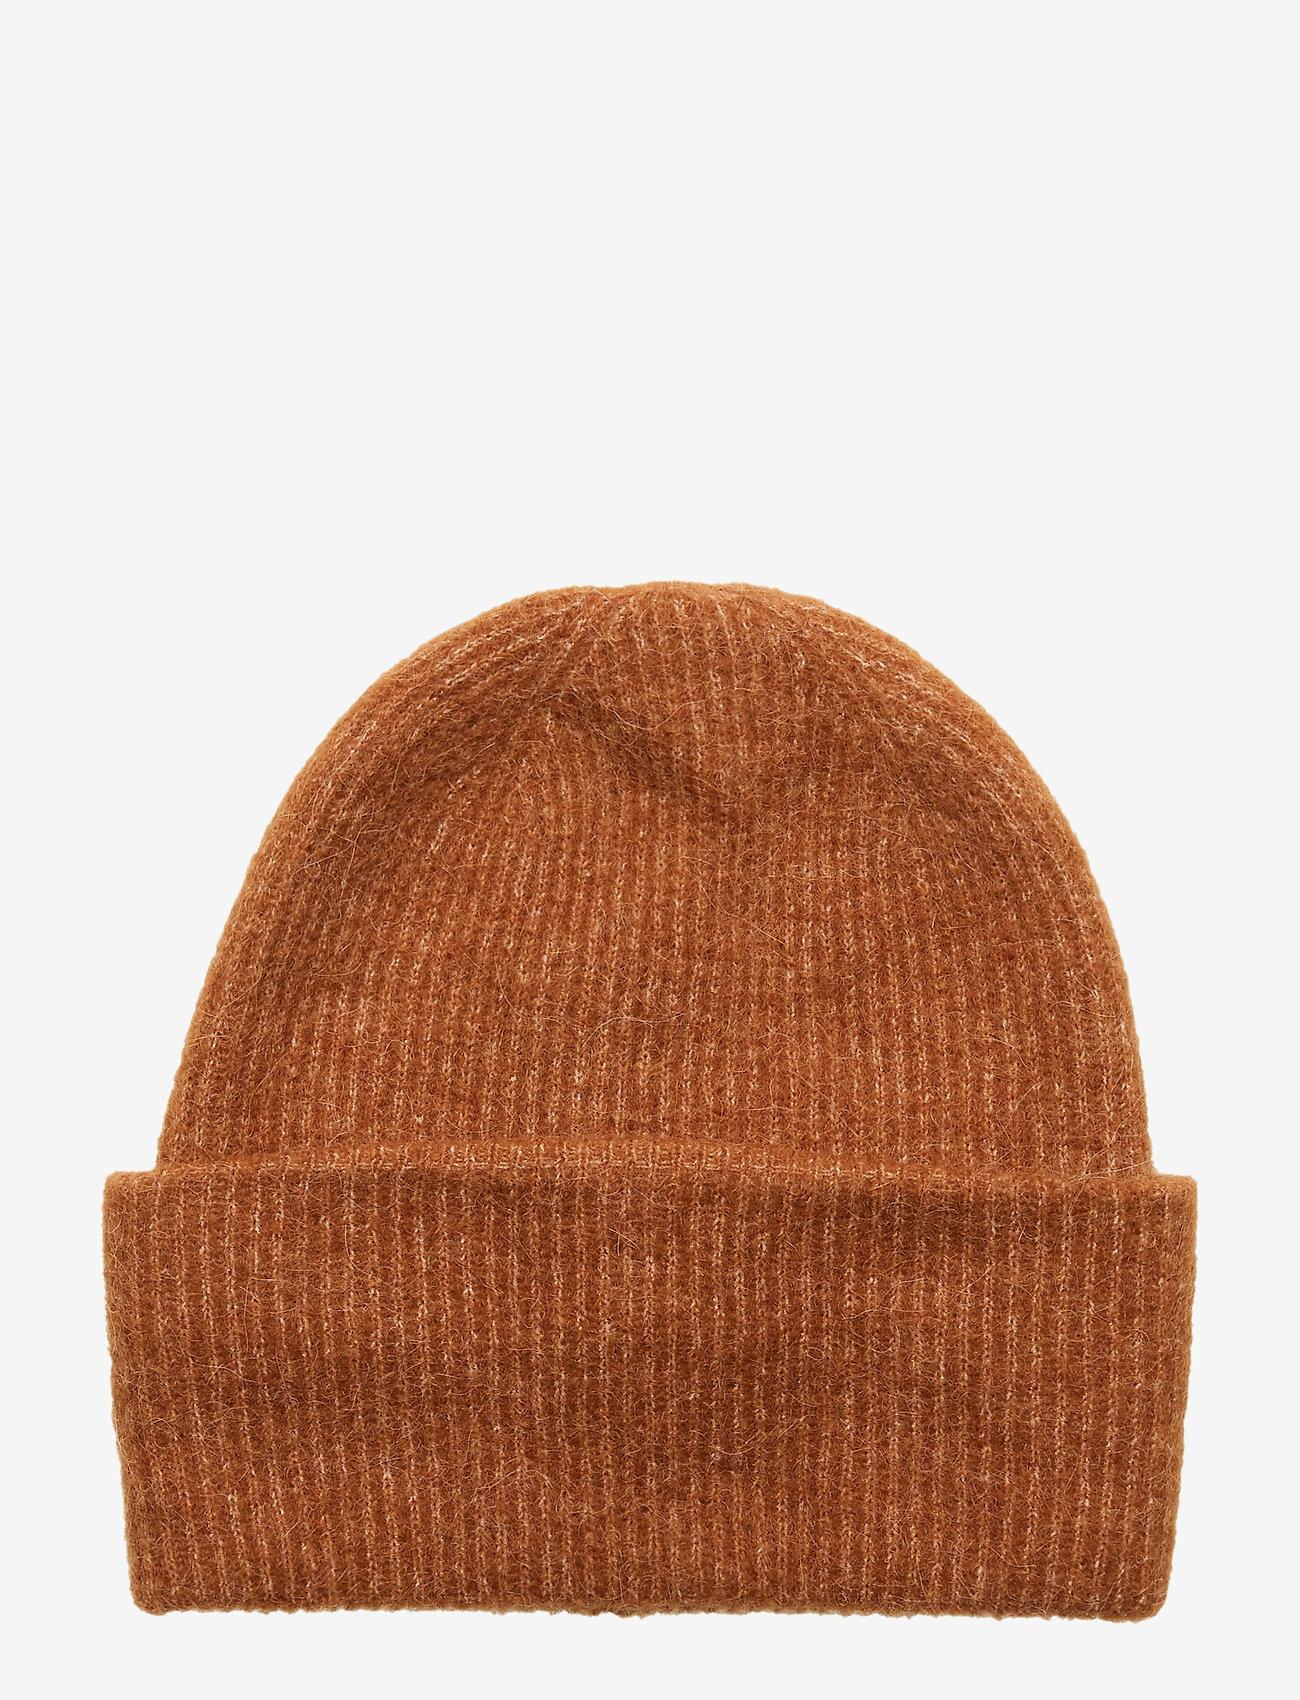 Samsøe Samsøe Nor hat 7355 - Czapki i kapelusze ARGAN OIL MEL. - Akcesoria